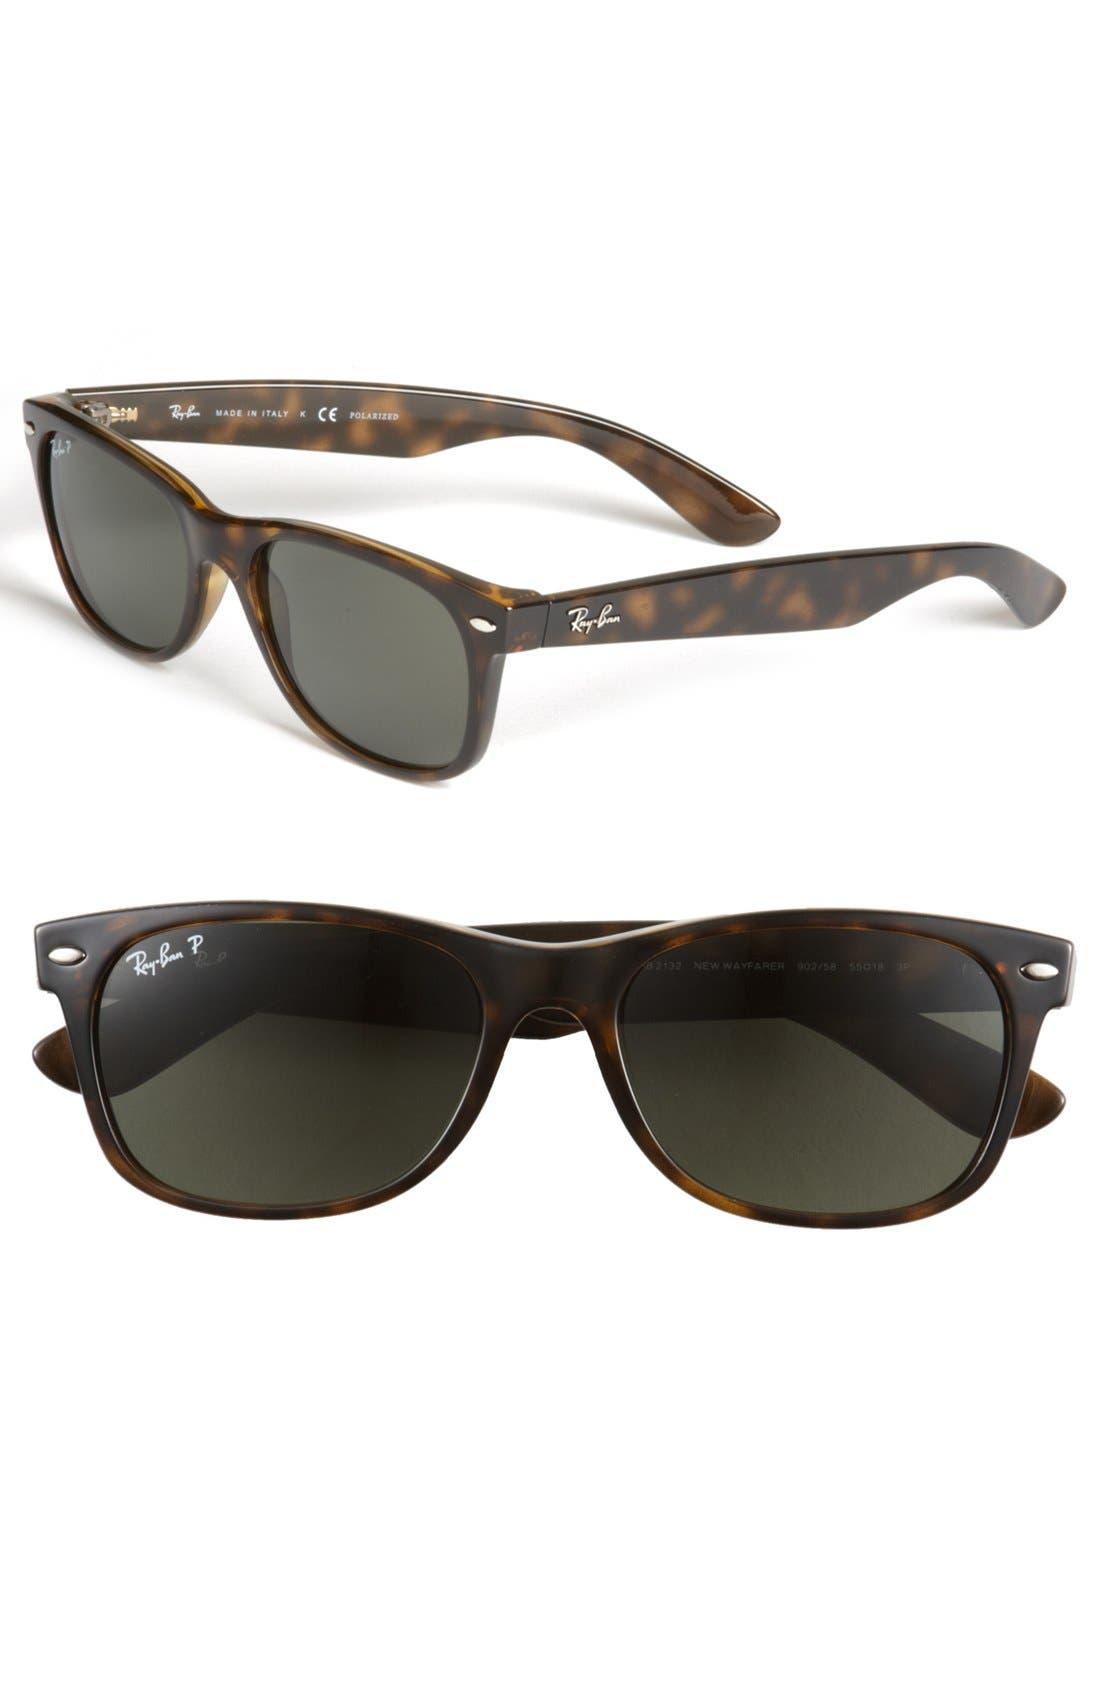 Main Image - Ray-Ban 'New Wayfarer' 55mm Polarized Sunglasses